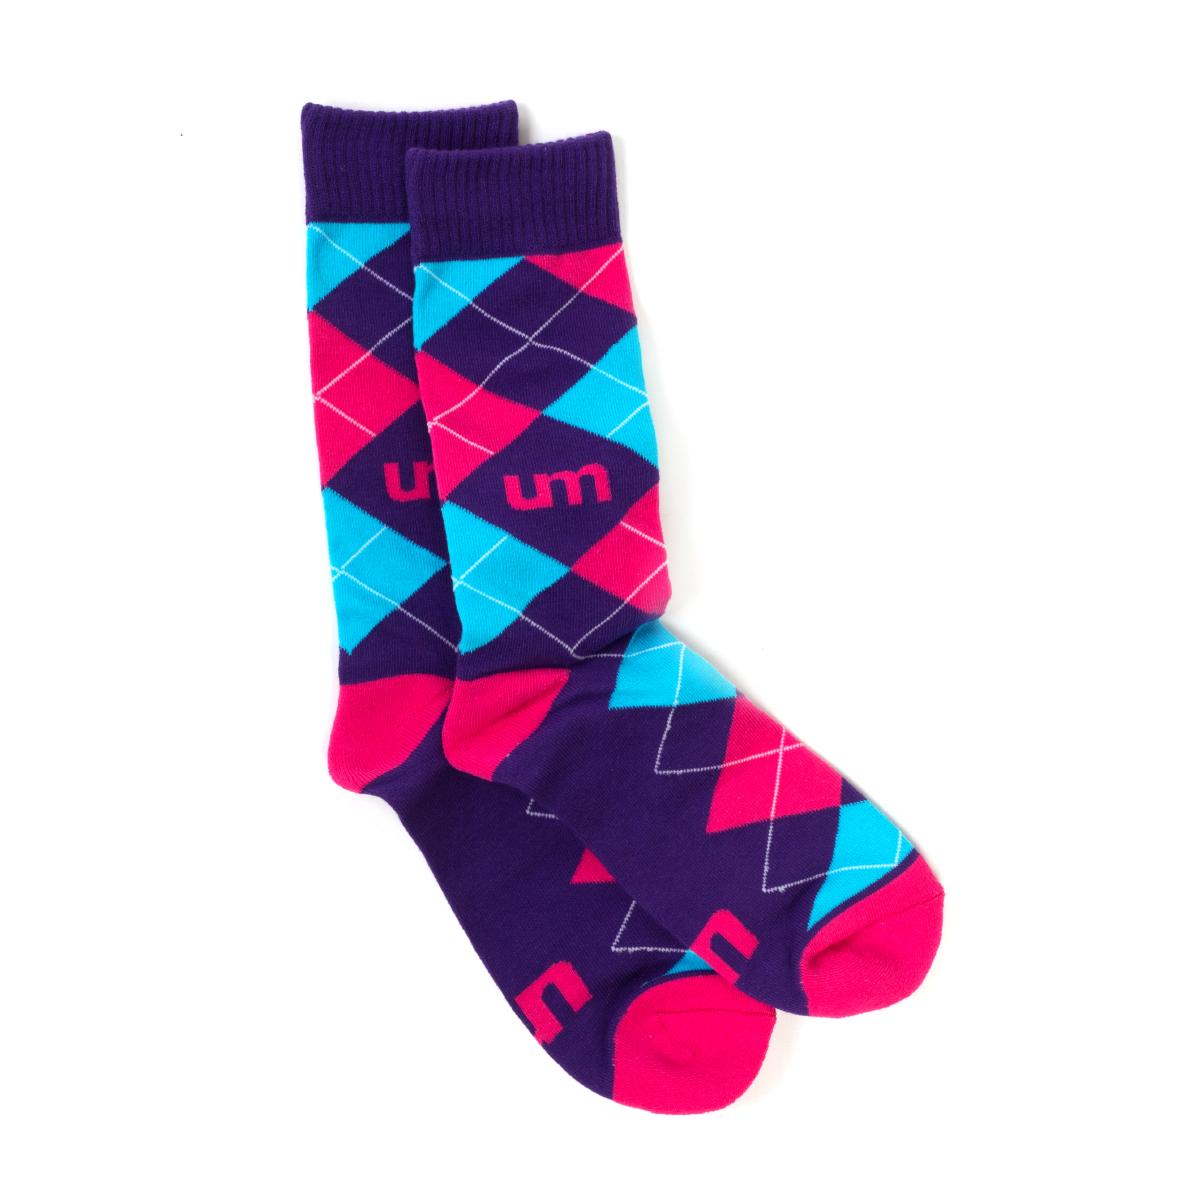 UM Christmas Socks